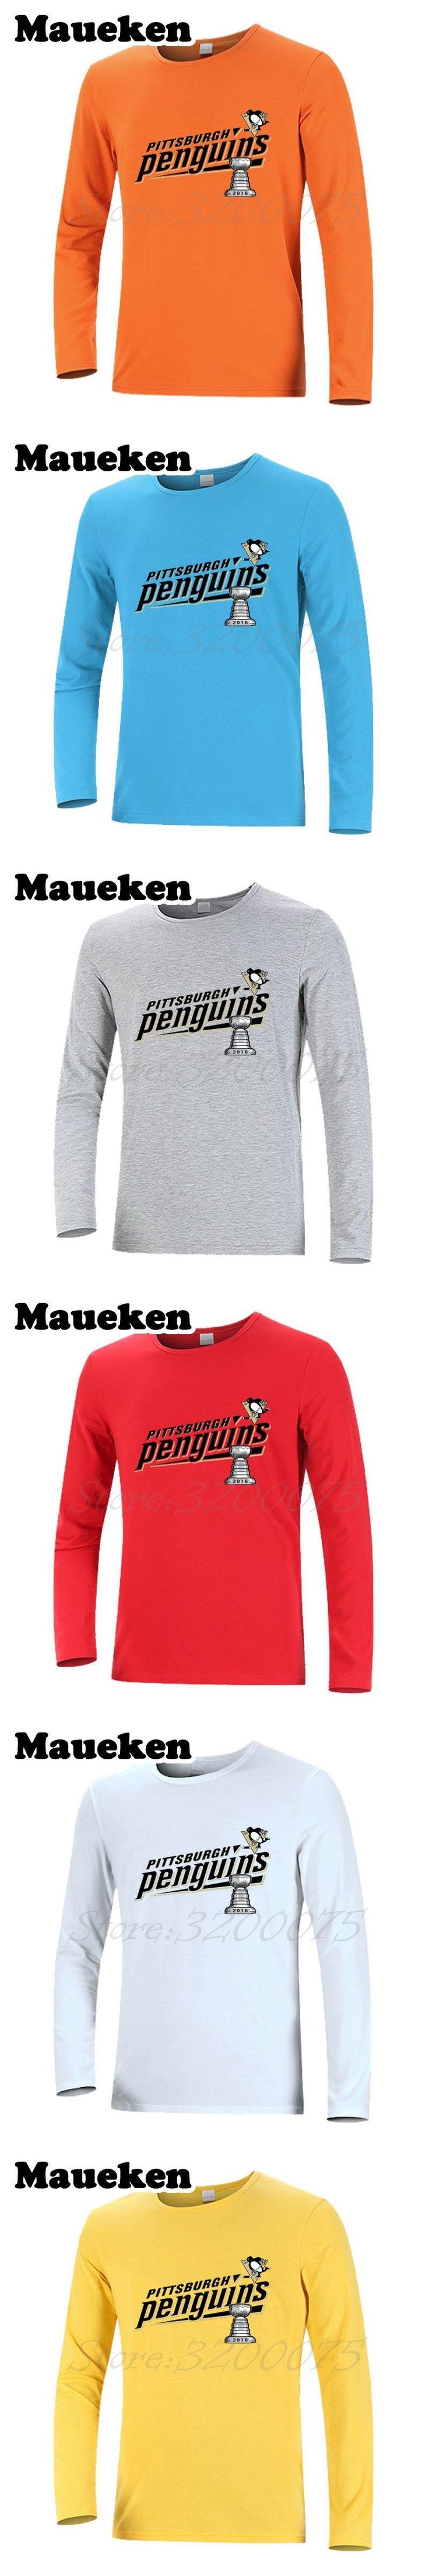 New Autumn Winter PITTSBURGH 2016 STANLEY CUP CHAMPIONS Men T-Shirt Long Sleeve T SHIRT Men's PENGUINS Championship W0901009